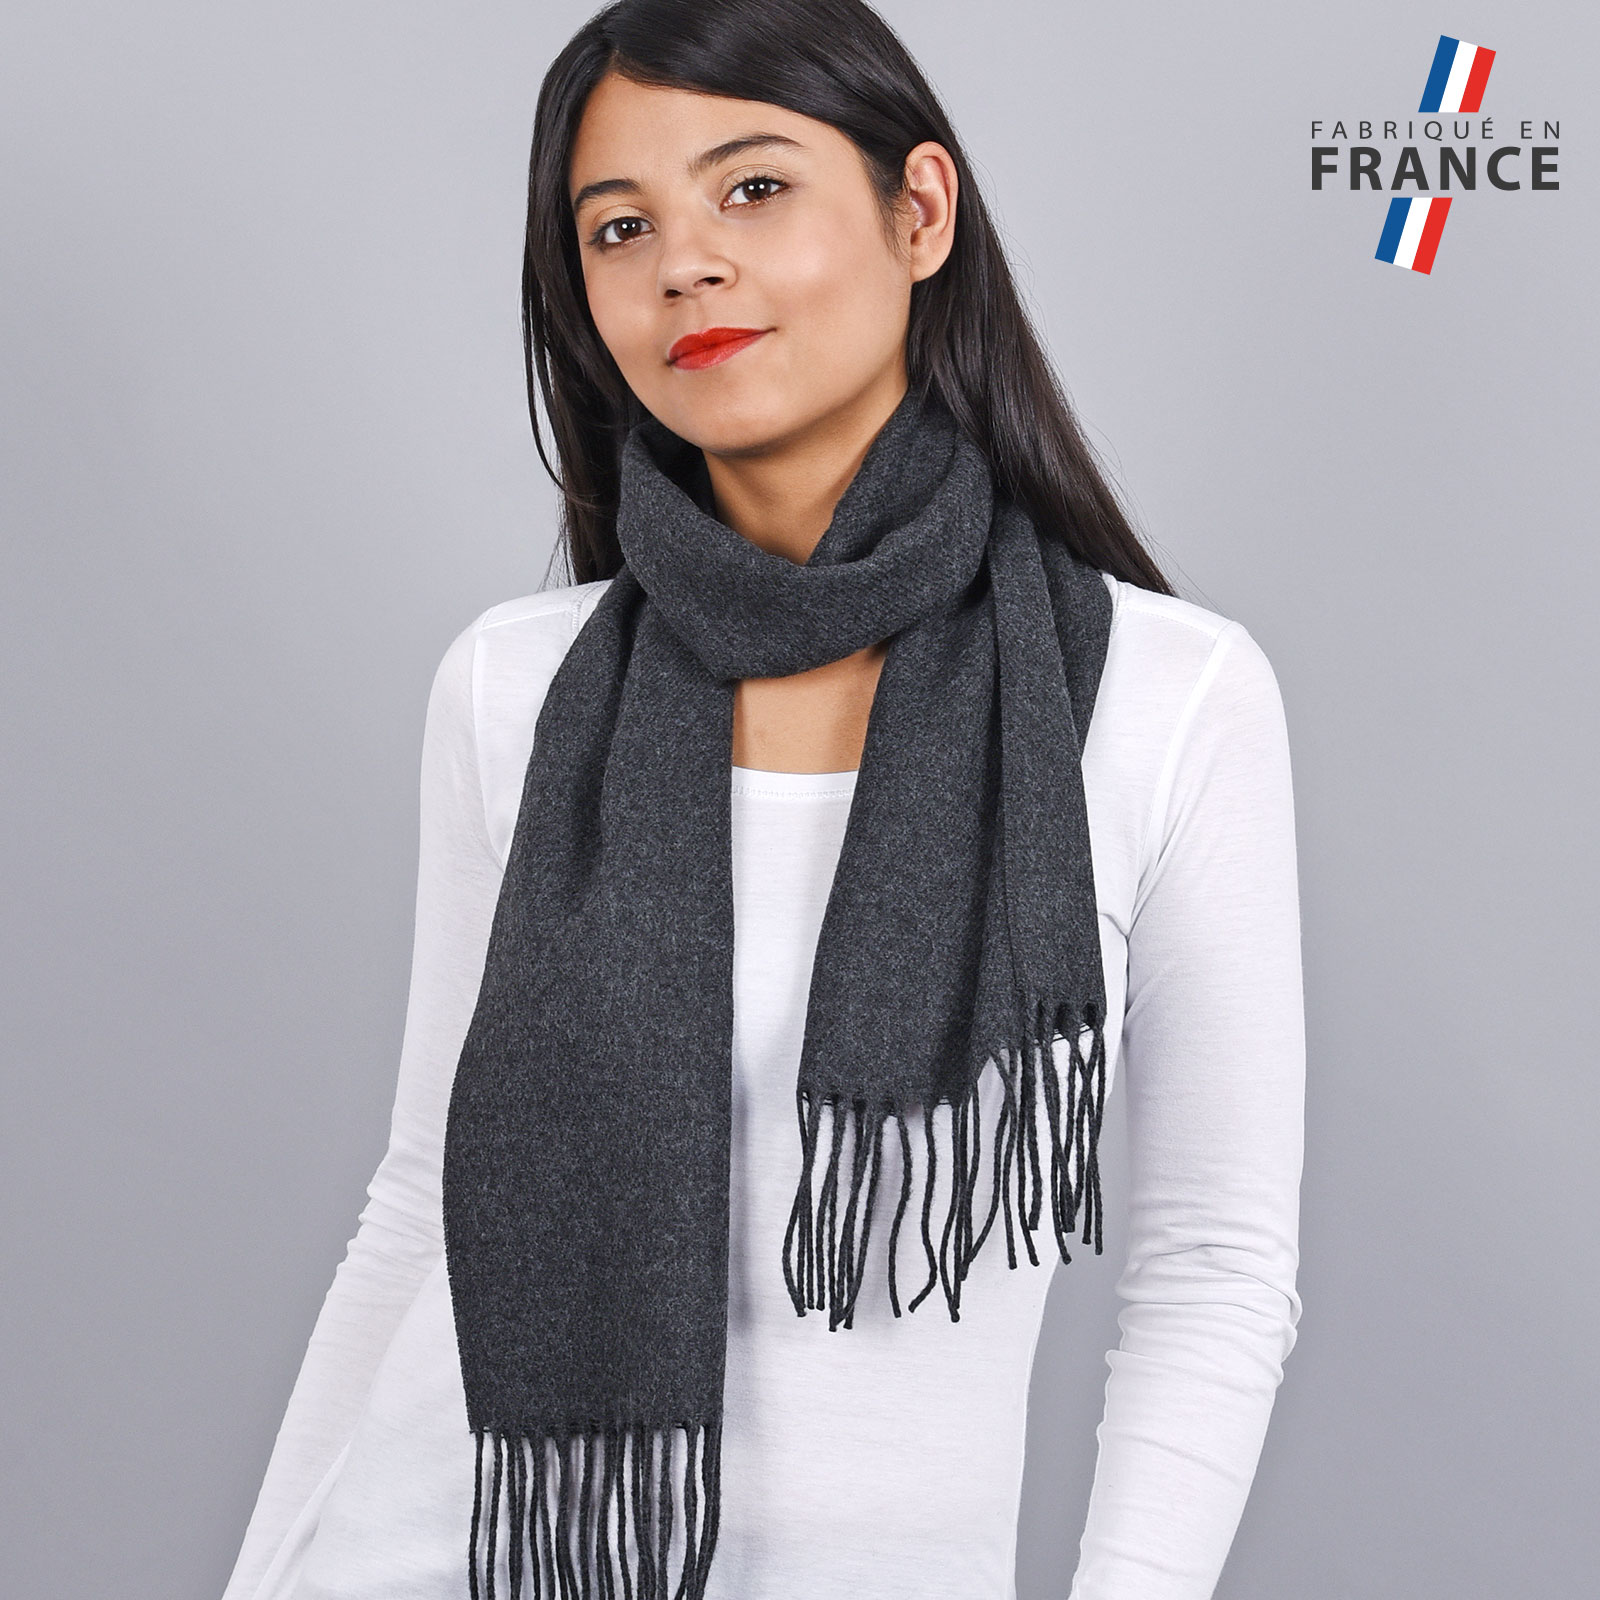 AT-03245-VF16-LB_FR-echarpe-franges-noir-femme-fabrication-francaise